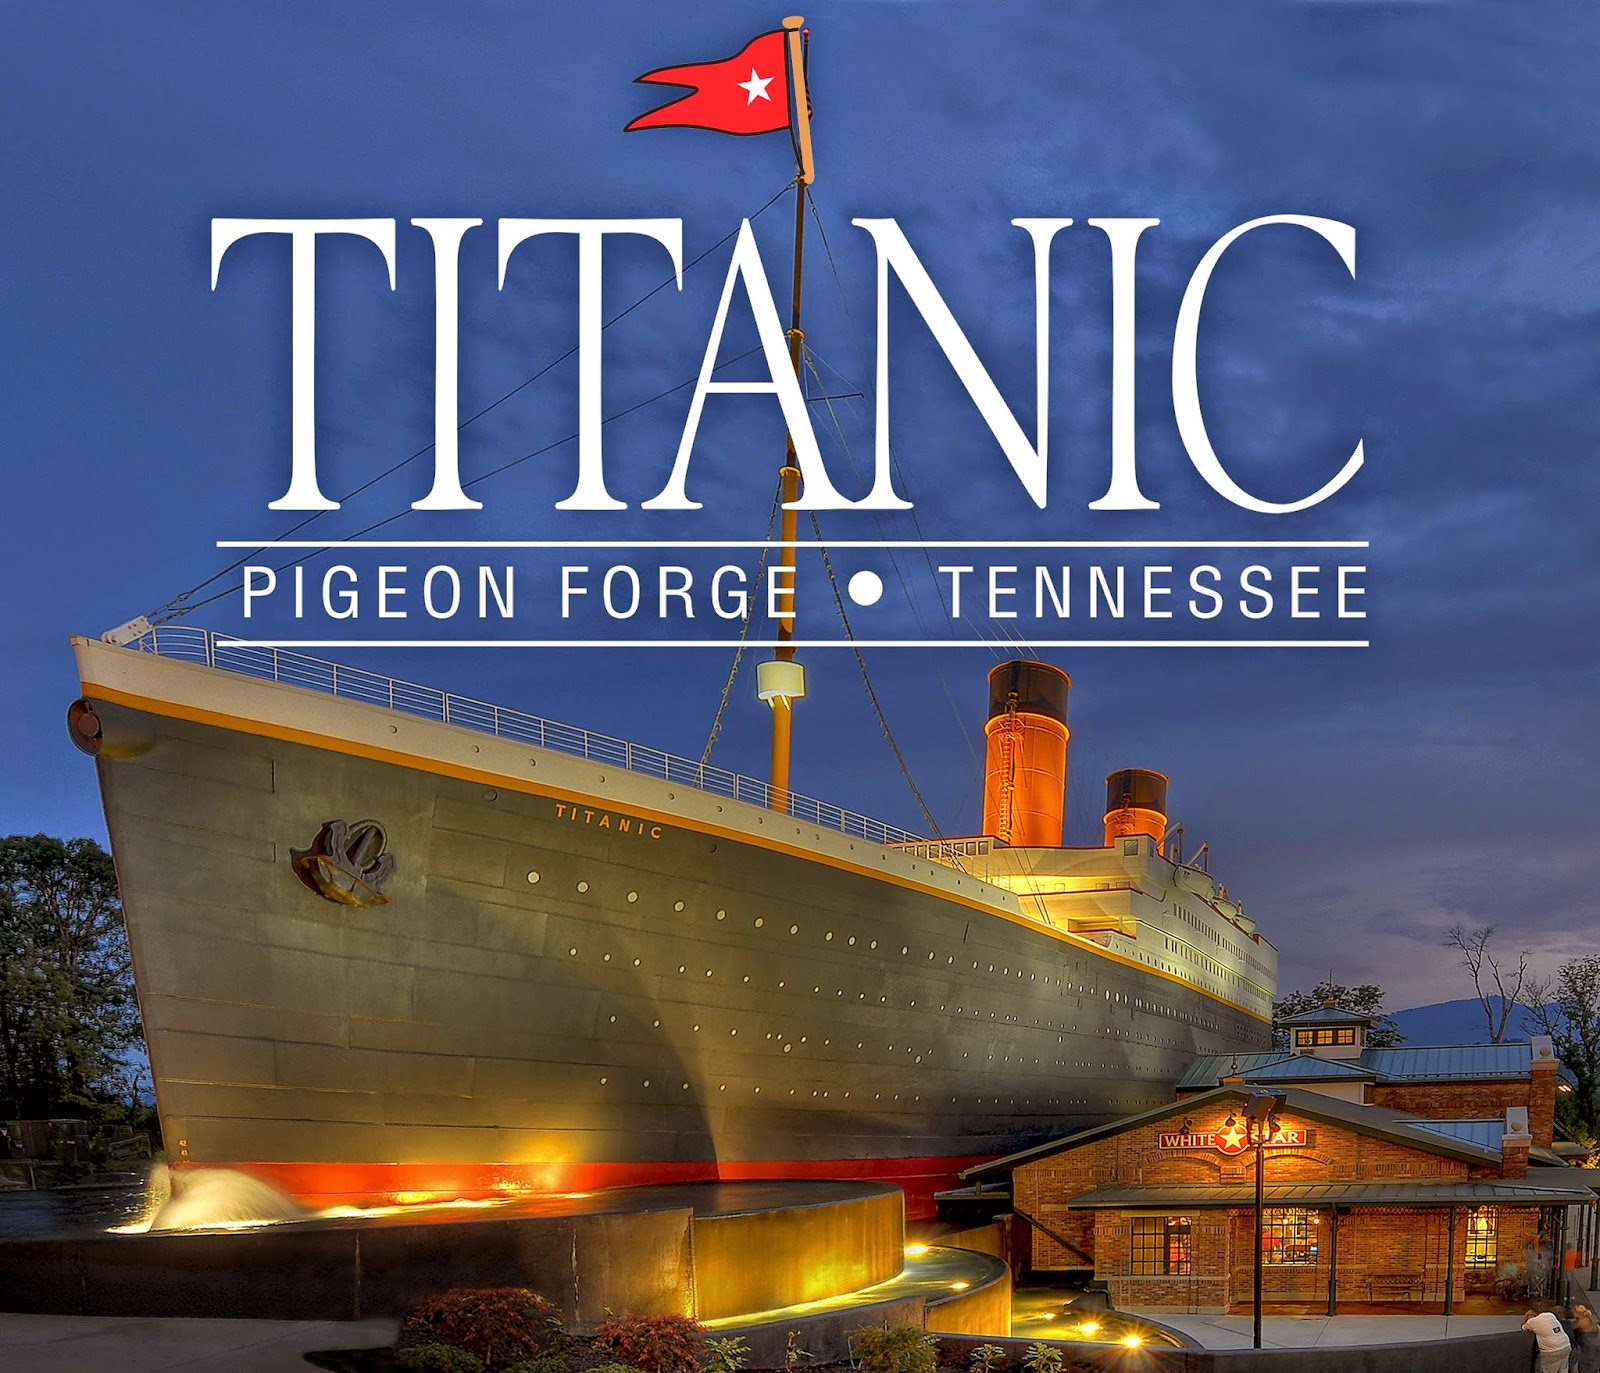 titanic pigeon forge tn